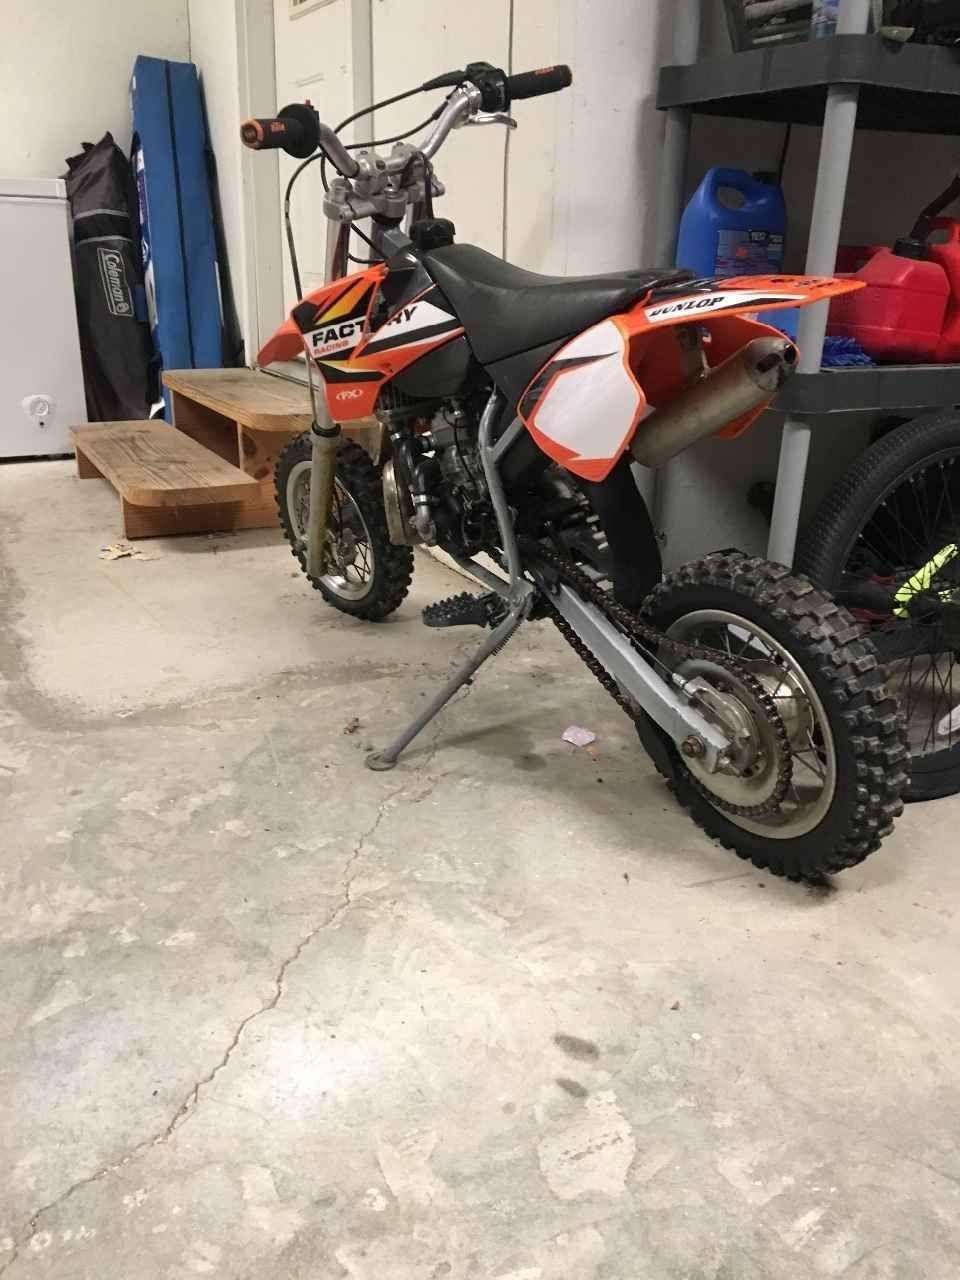 2002 Ktm Sx 50 Pro Senior Lc Ktm Motorcycles For Sale Red Bull Ktm